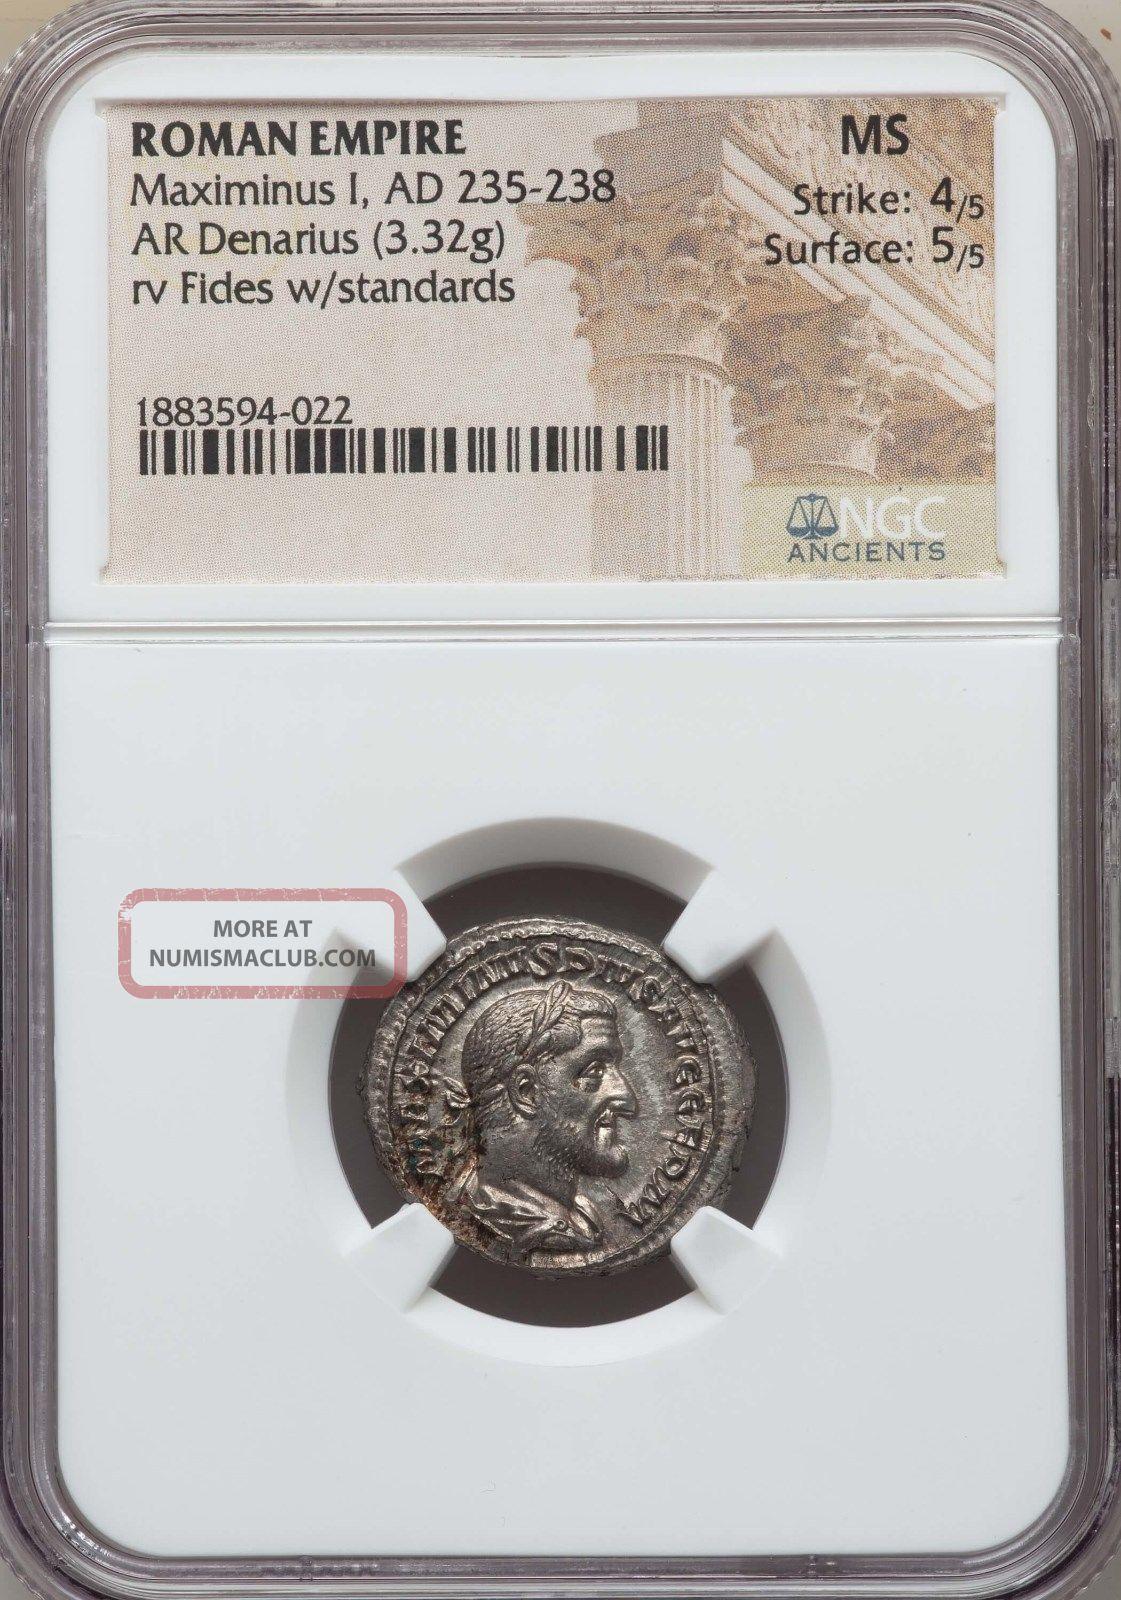 Maximinus Ad 235 - 238 Ar Denarius Ngc Ms 4/5 - 5/5 Ancient Roman Silver Coin Coins: Ancient photo